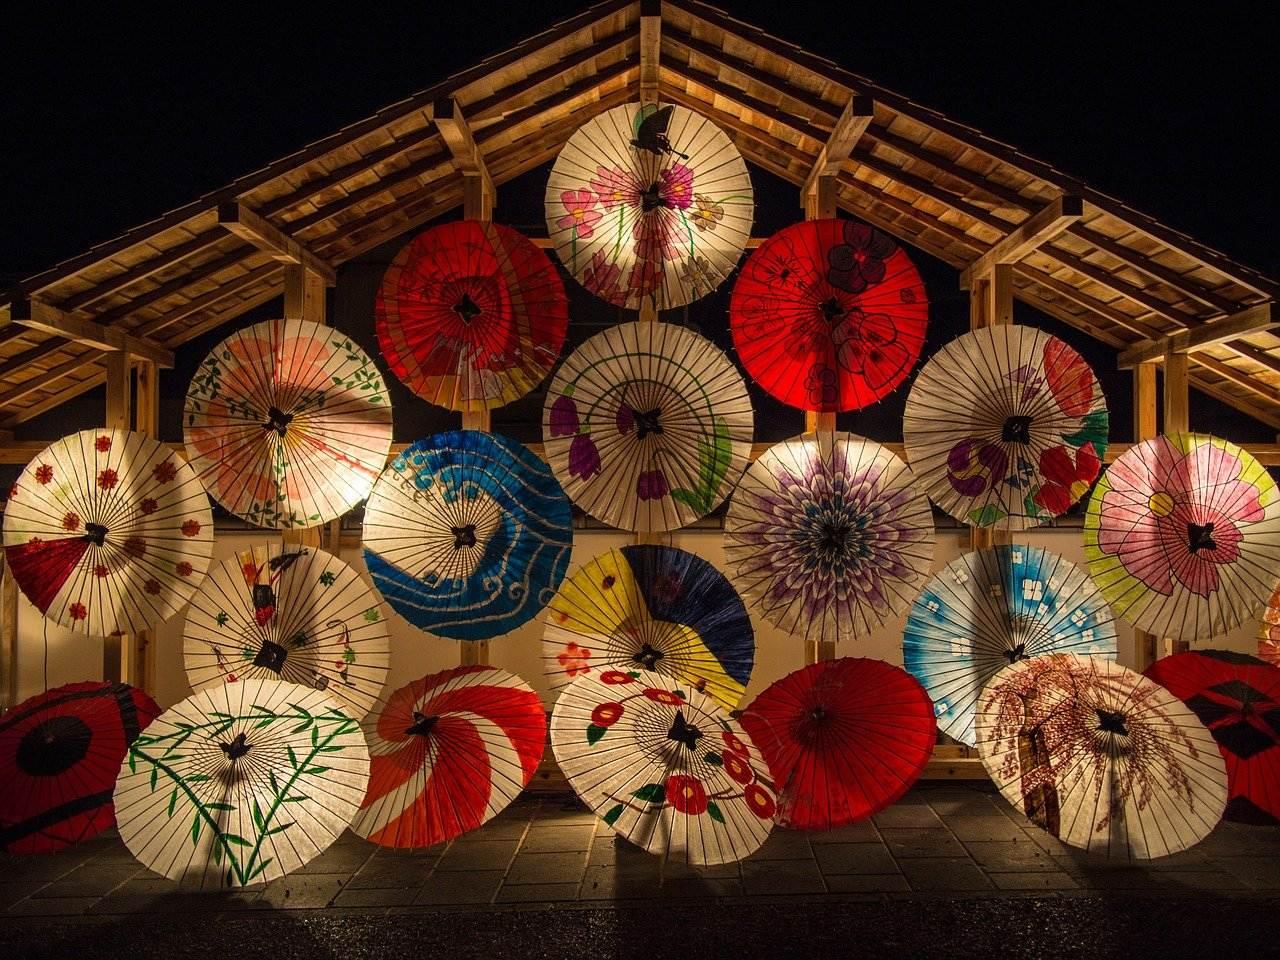 japanese umbrellas, parasols, illuminated